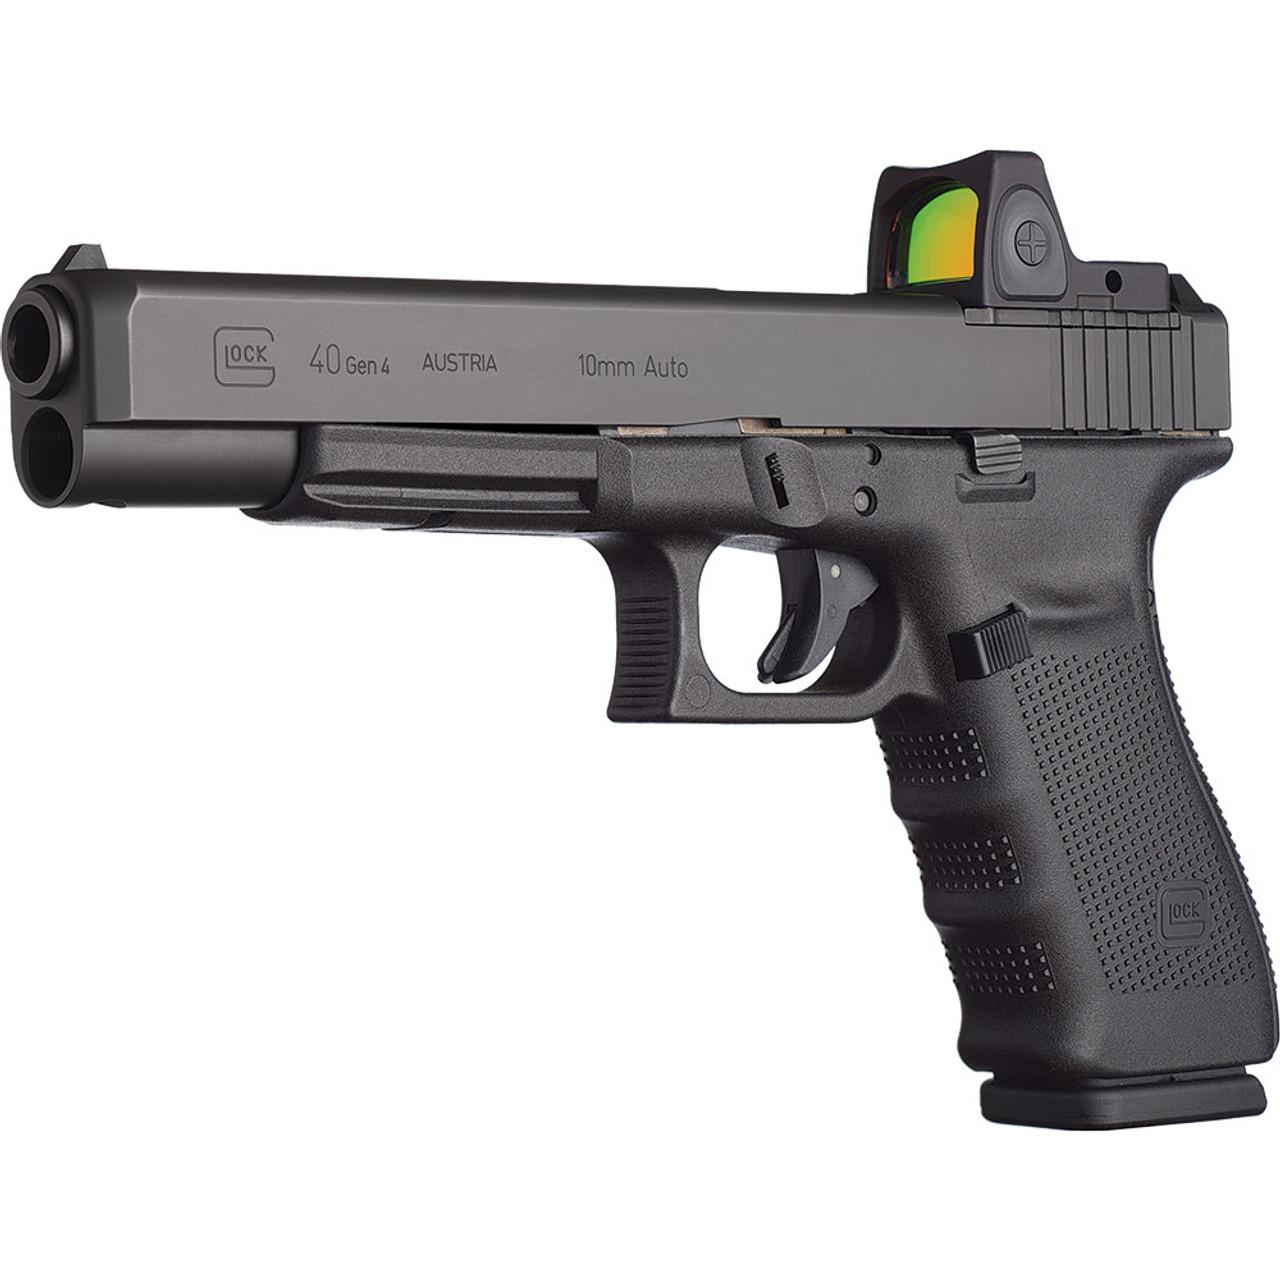 GLOCK 40 Gen4 MOS - 15rd - Fixed Sights